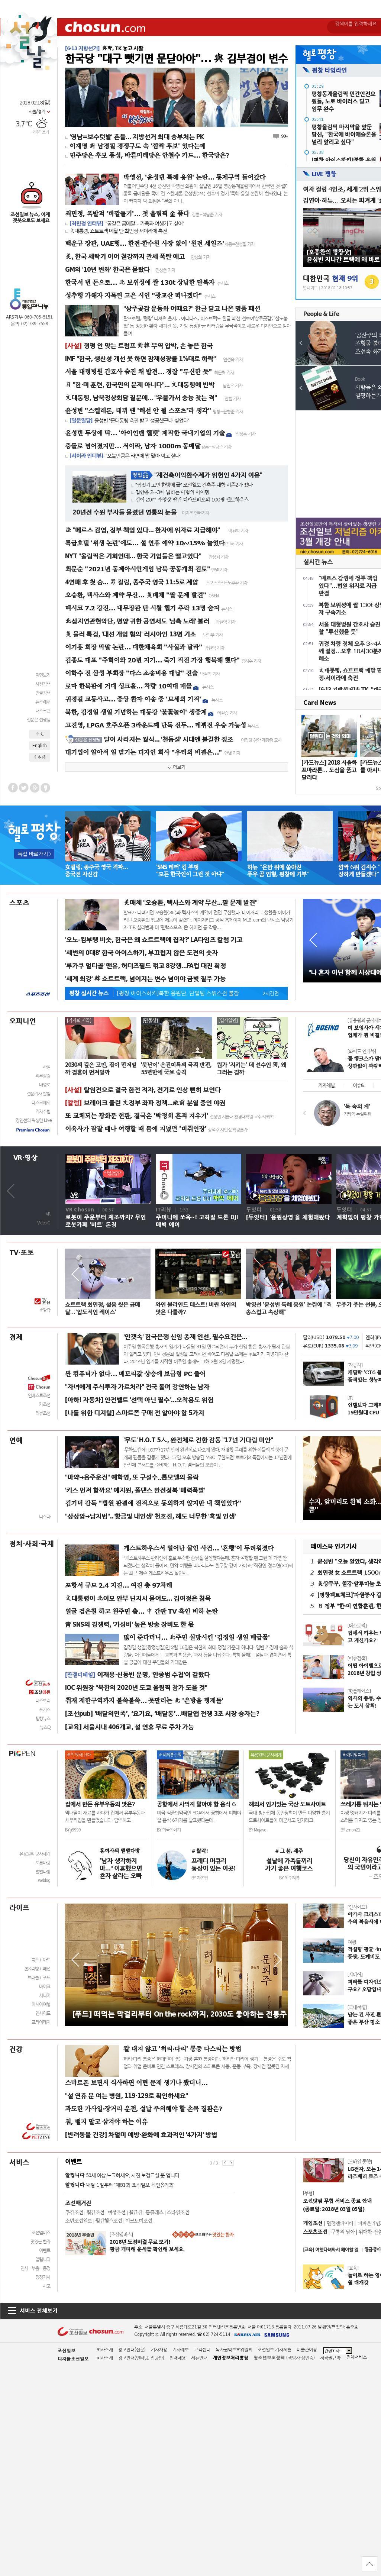 chosun.com at Sunday Feb. 18, 2018, 5:01 a.m. UTC